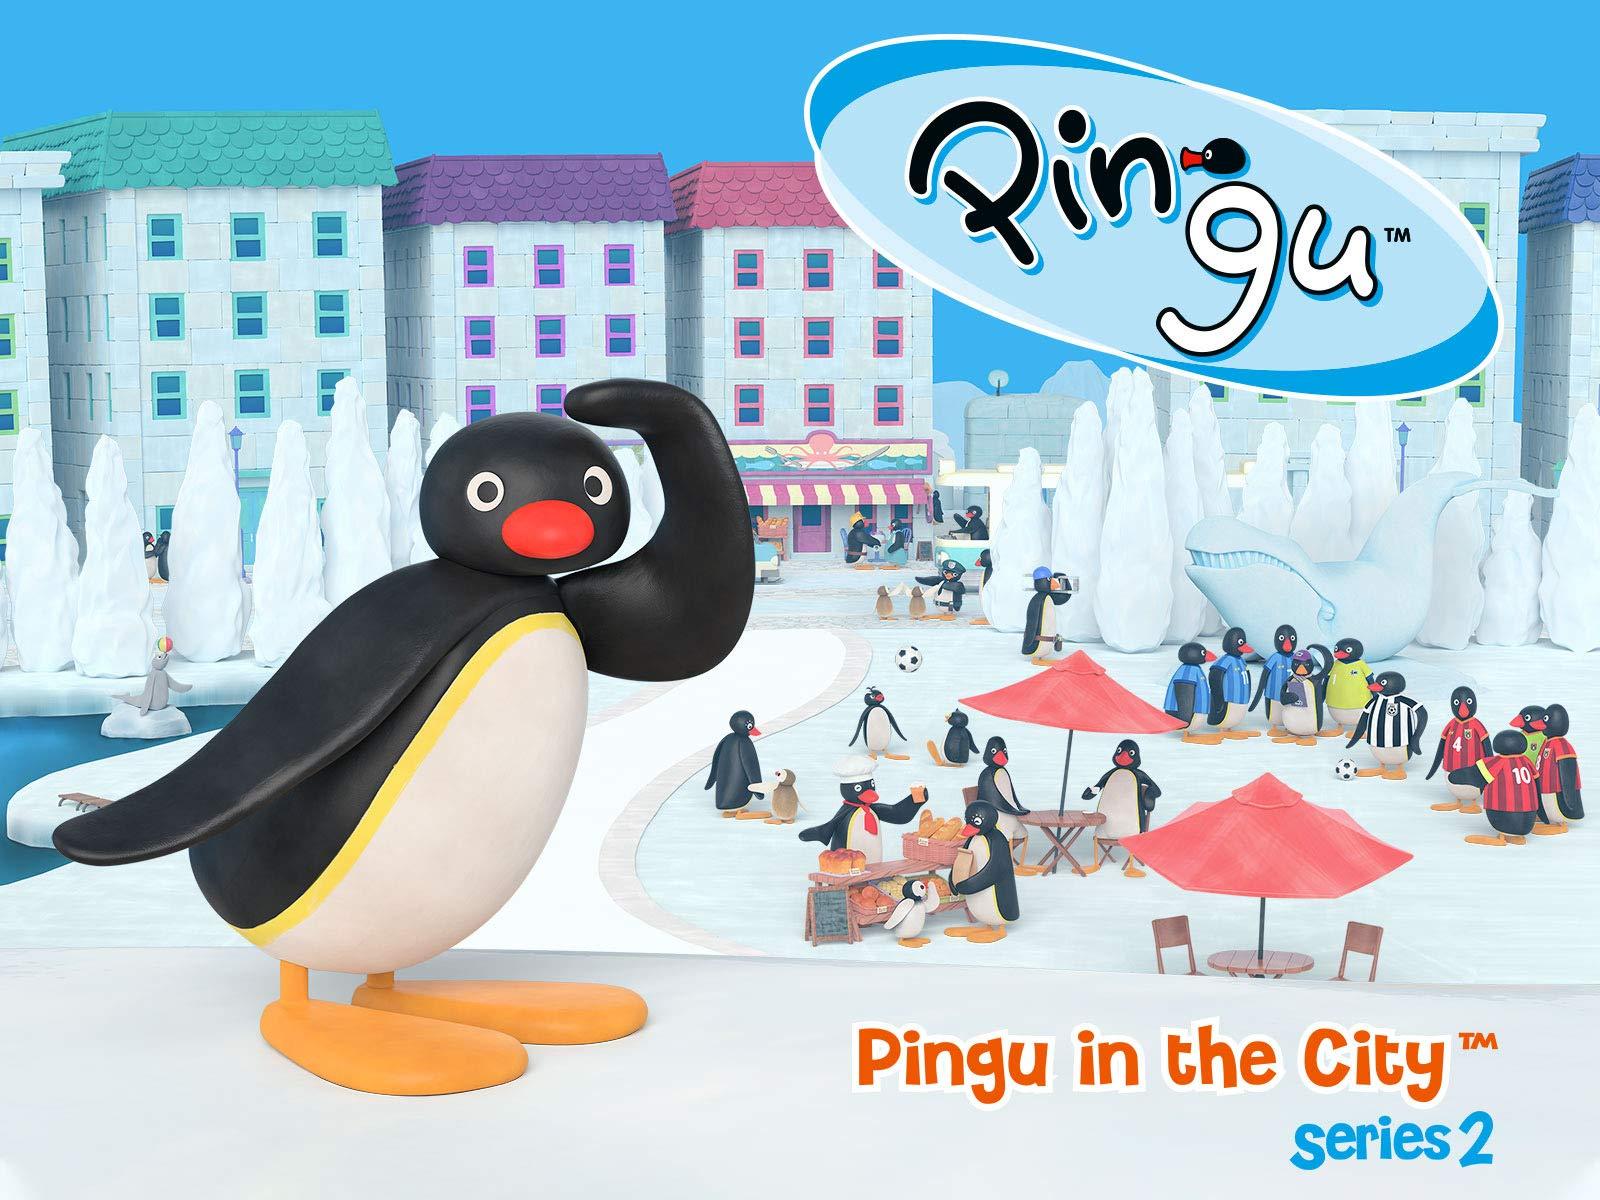 Pingu in The City: Series 2